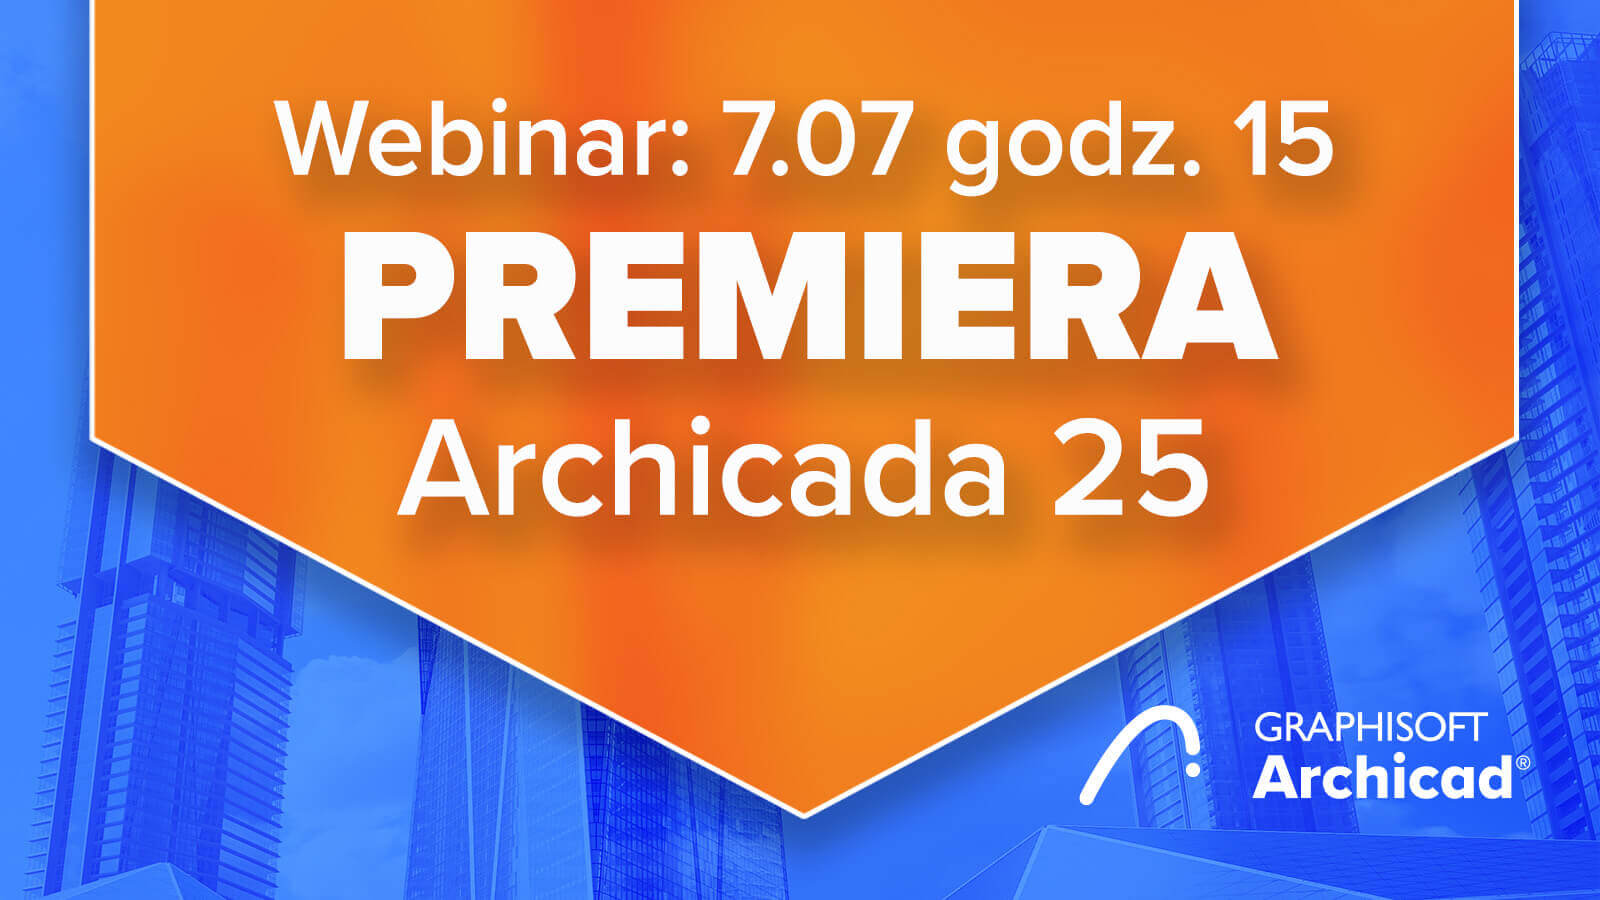 Premiera Archicada 25